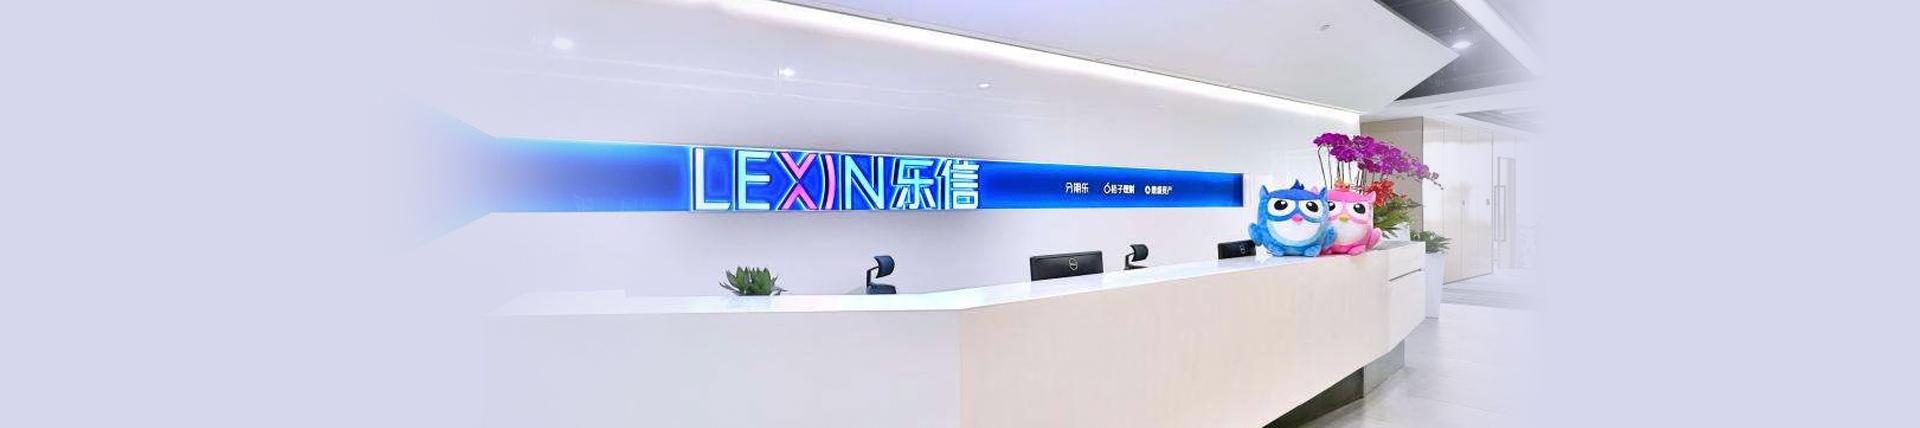 Lexin.com搞定!乐信斥资百万美金收购品牌双拼完成升级!